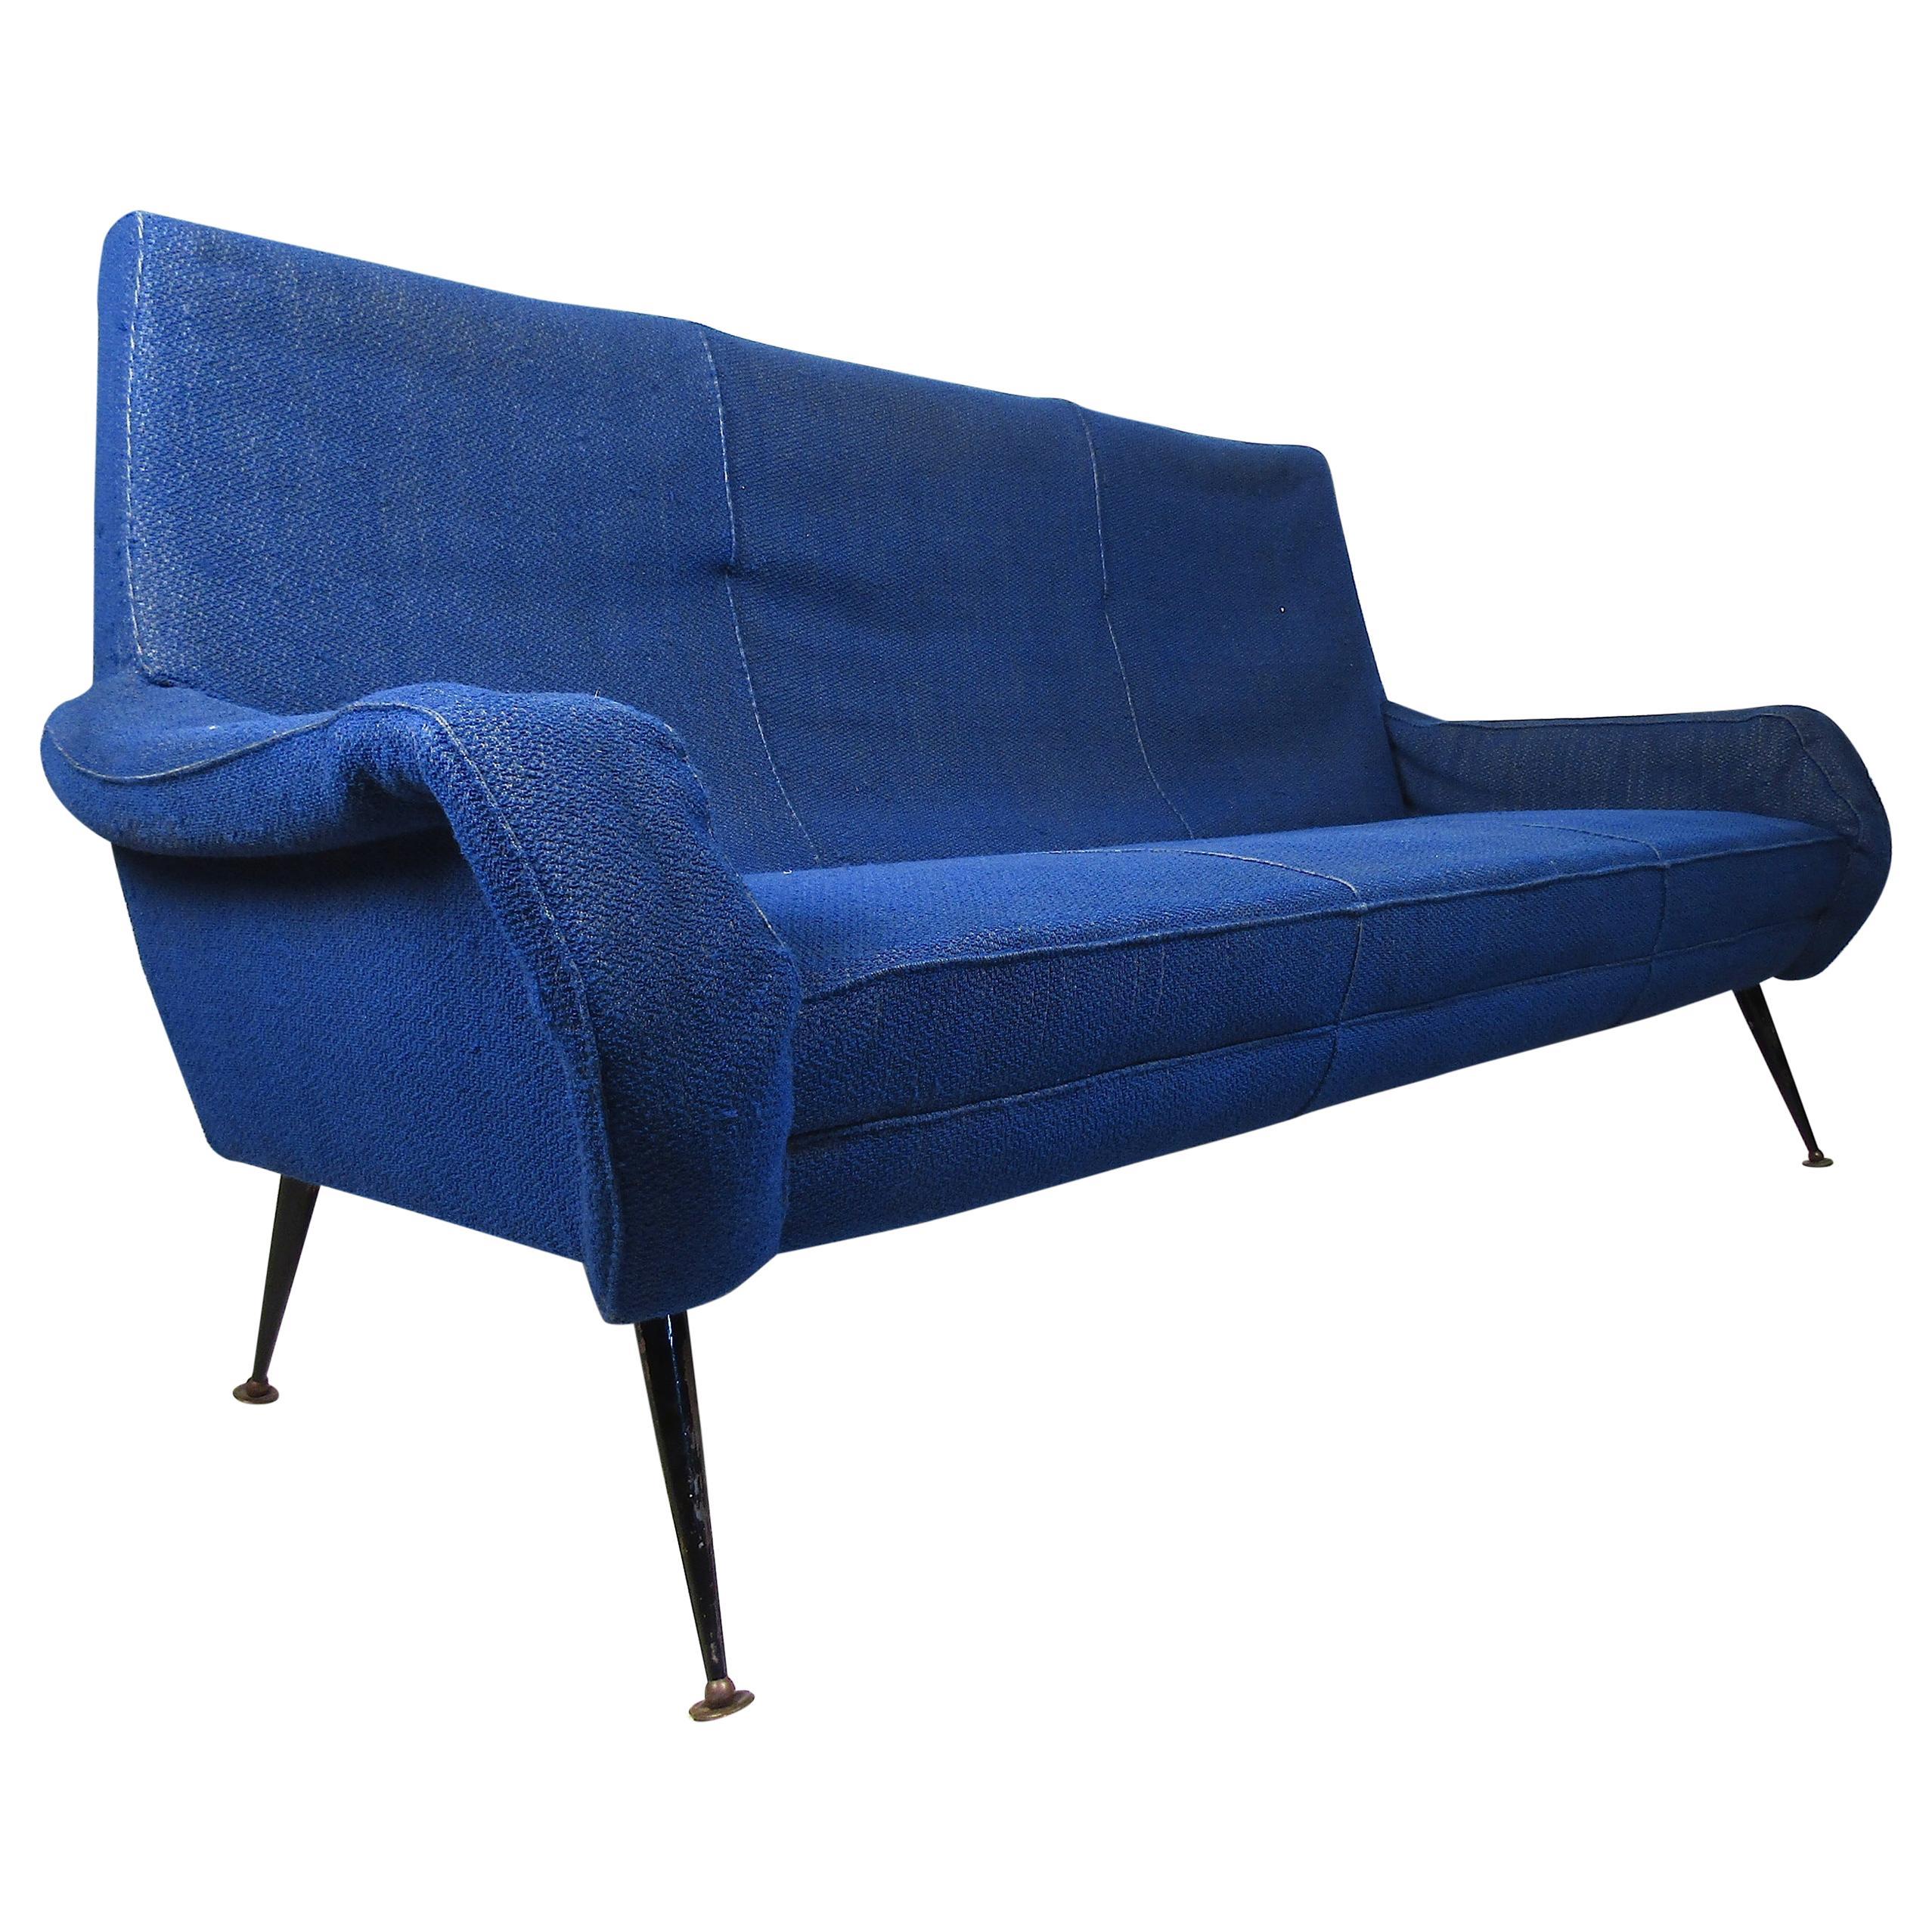 Mid-Century Modern Italian Sofa in the Style of Marco Zanuso